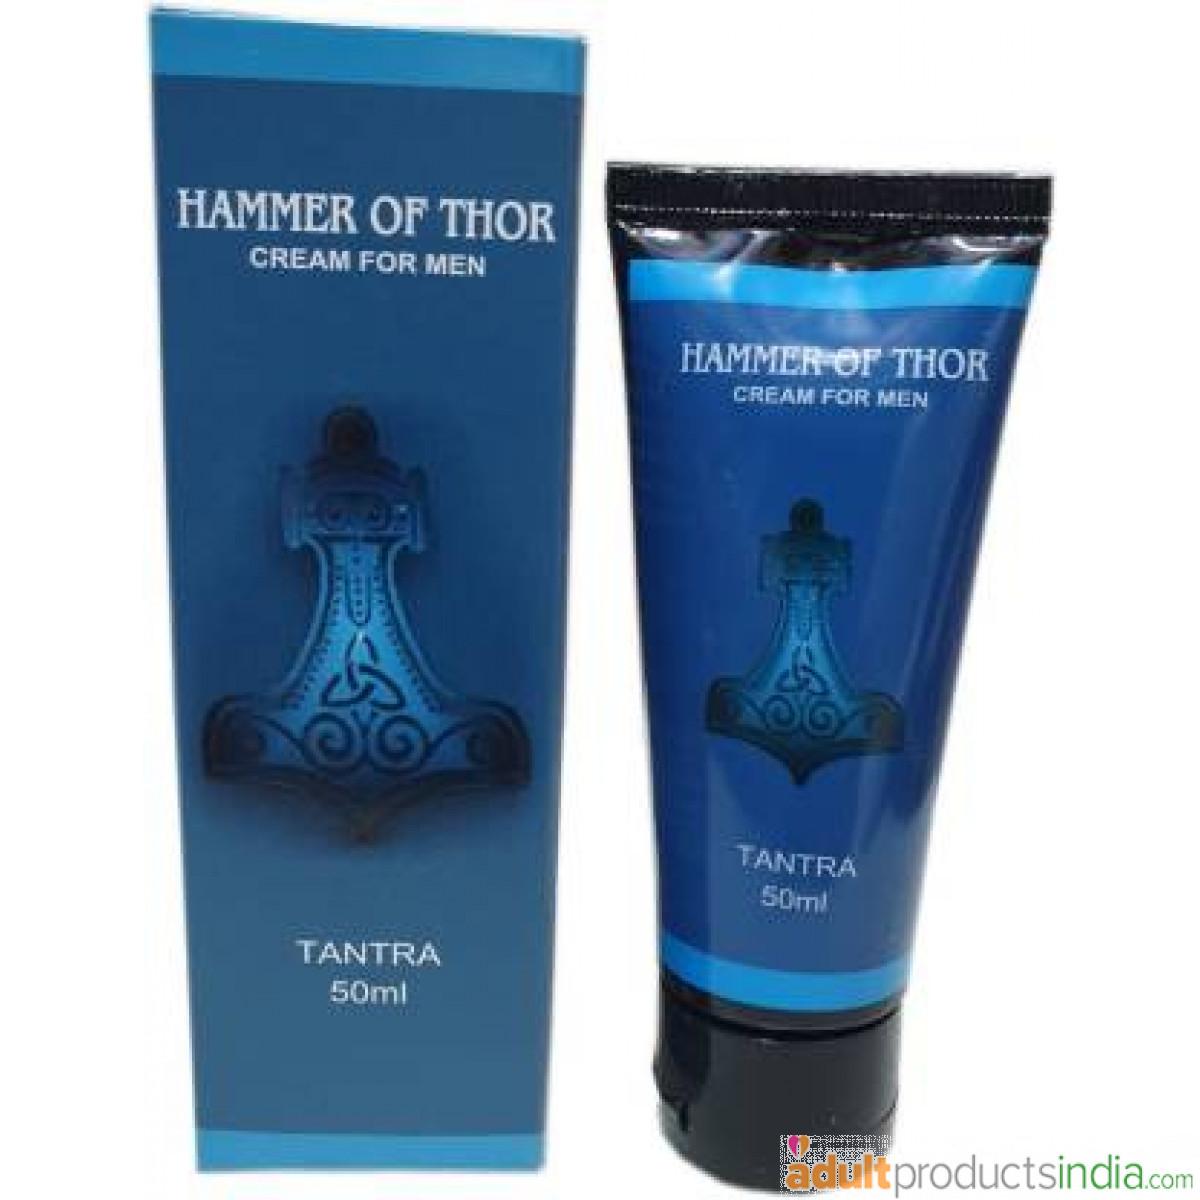 Hammer Of Thor Enlargement Cream For Men